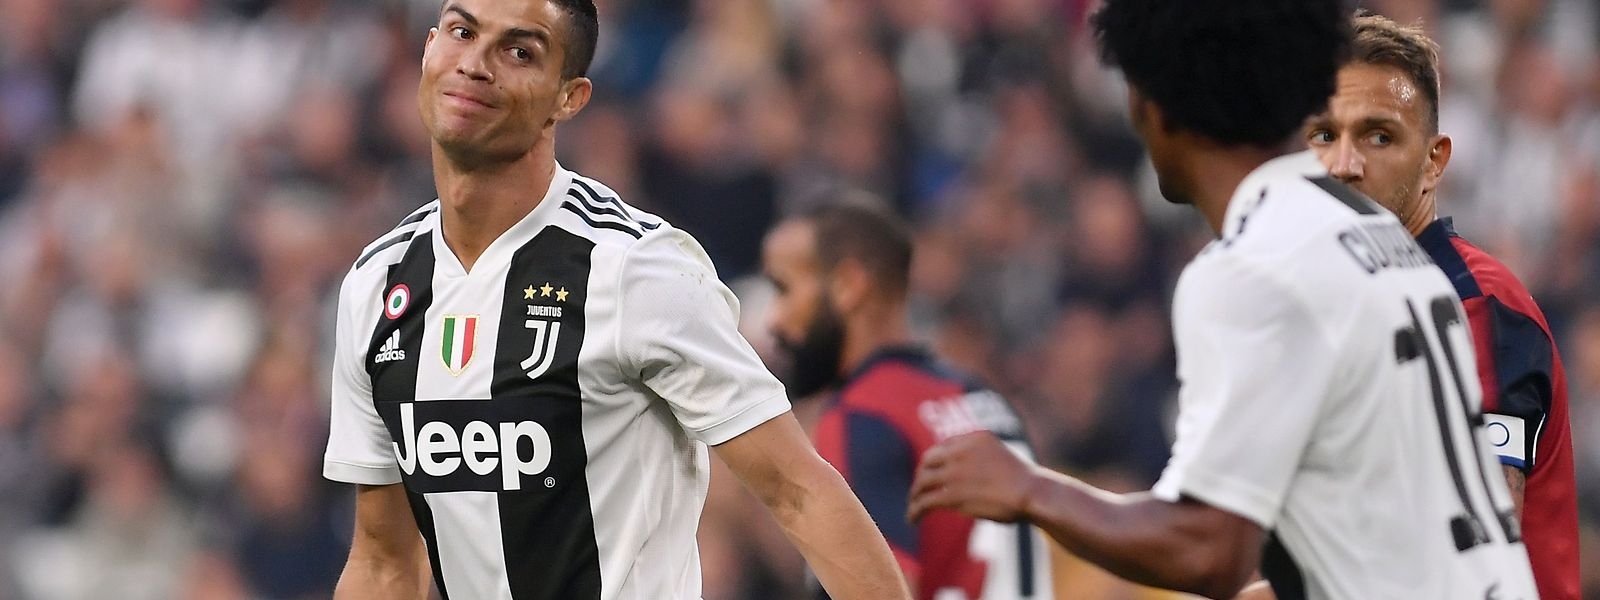 Cristiano Ronaldo sera de retour ce mardi soir à Old Trafford avec la Juventus Turin